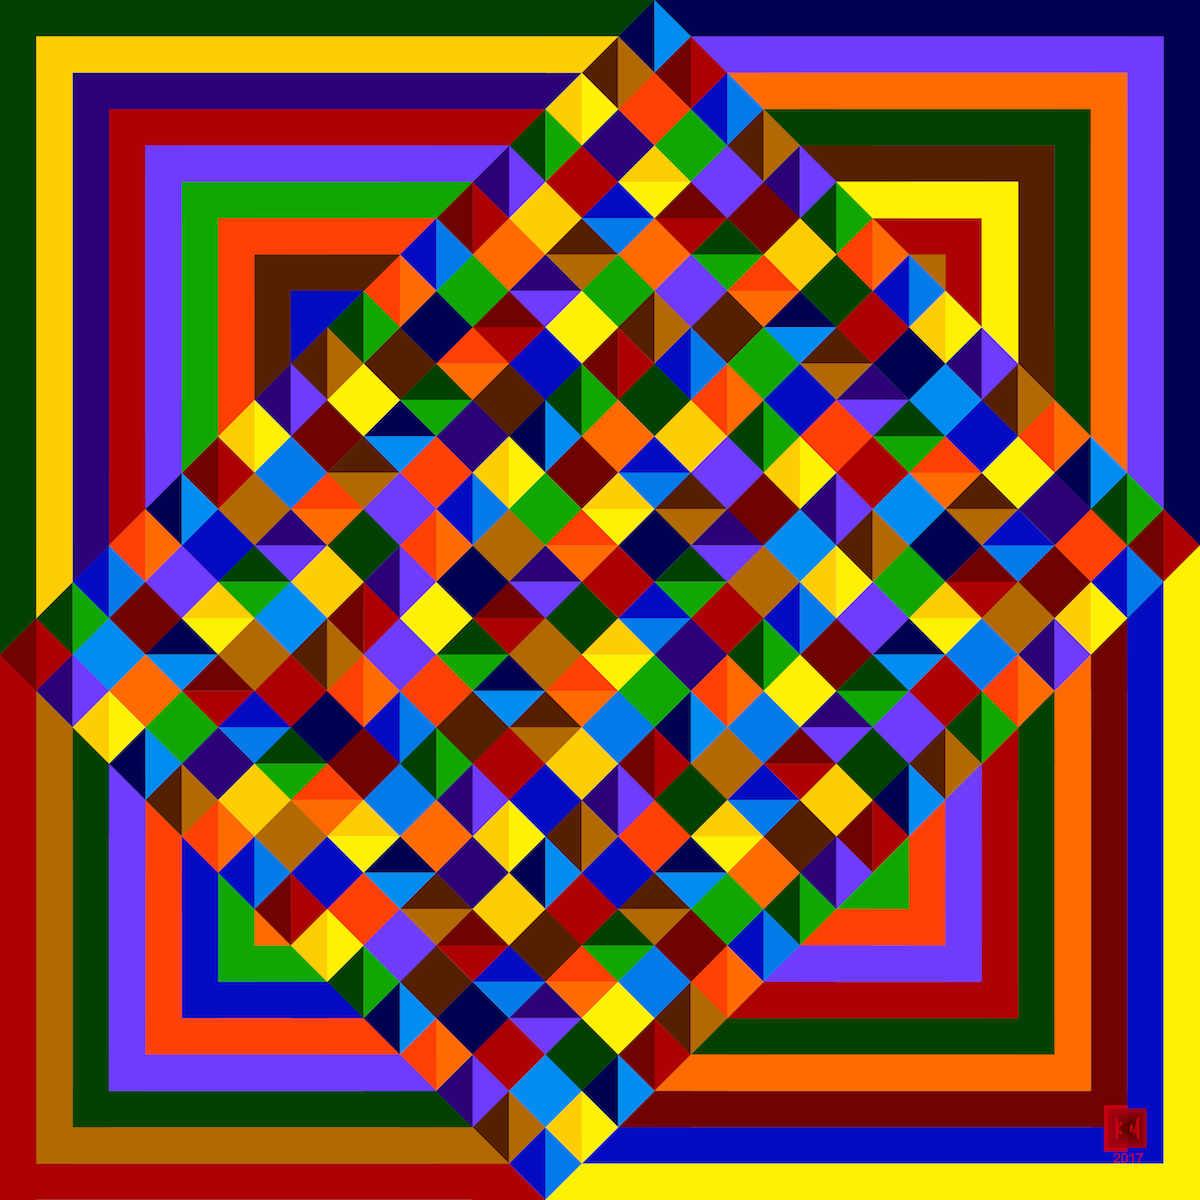 076 (495 x 495).jpg